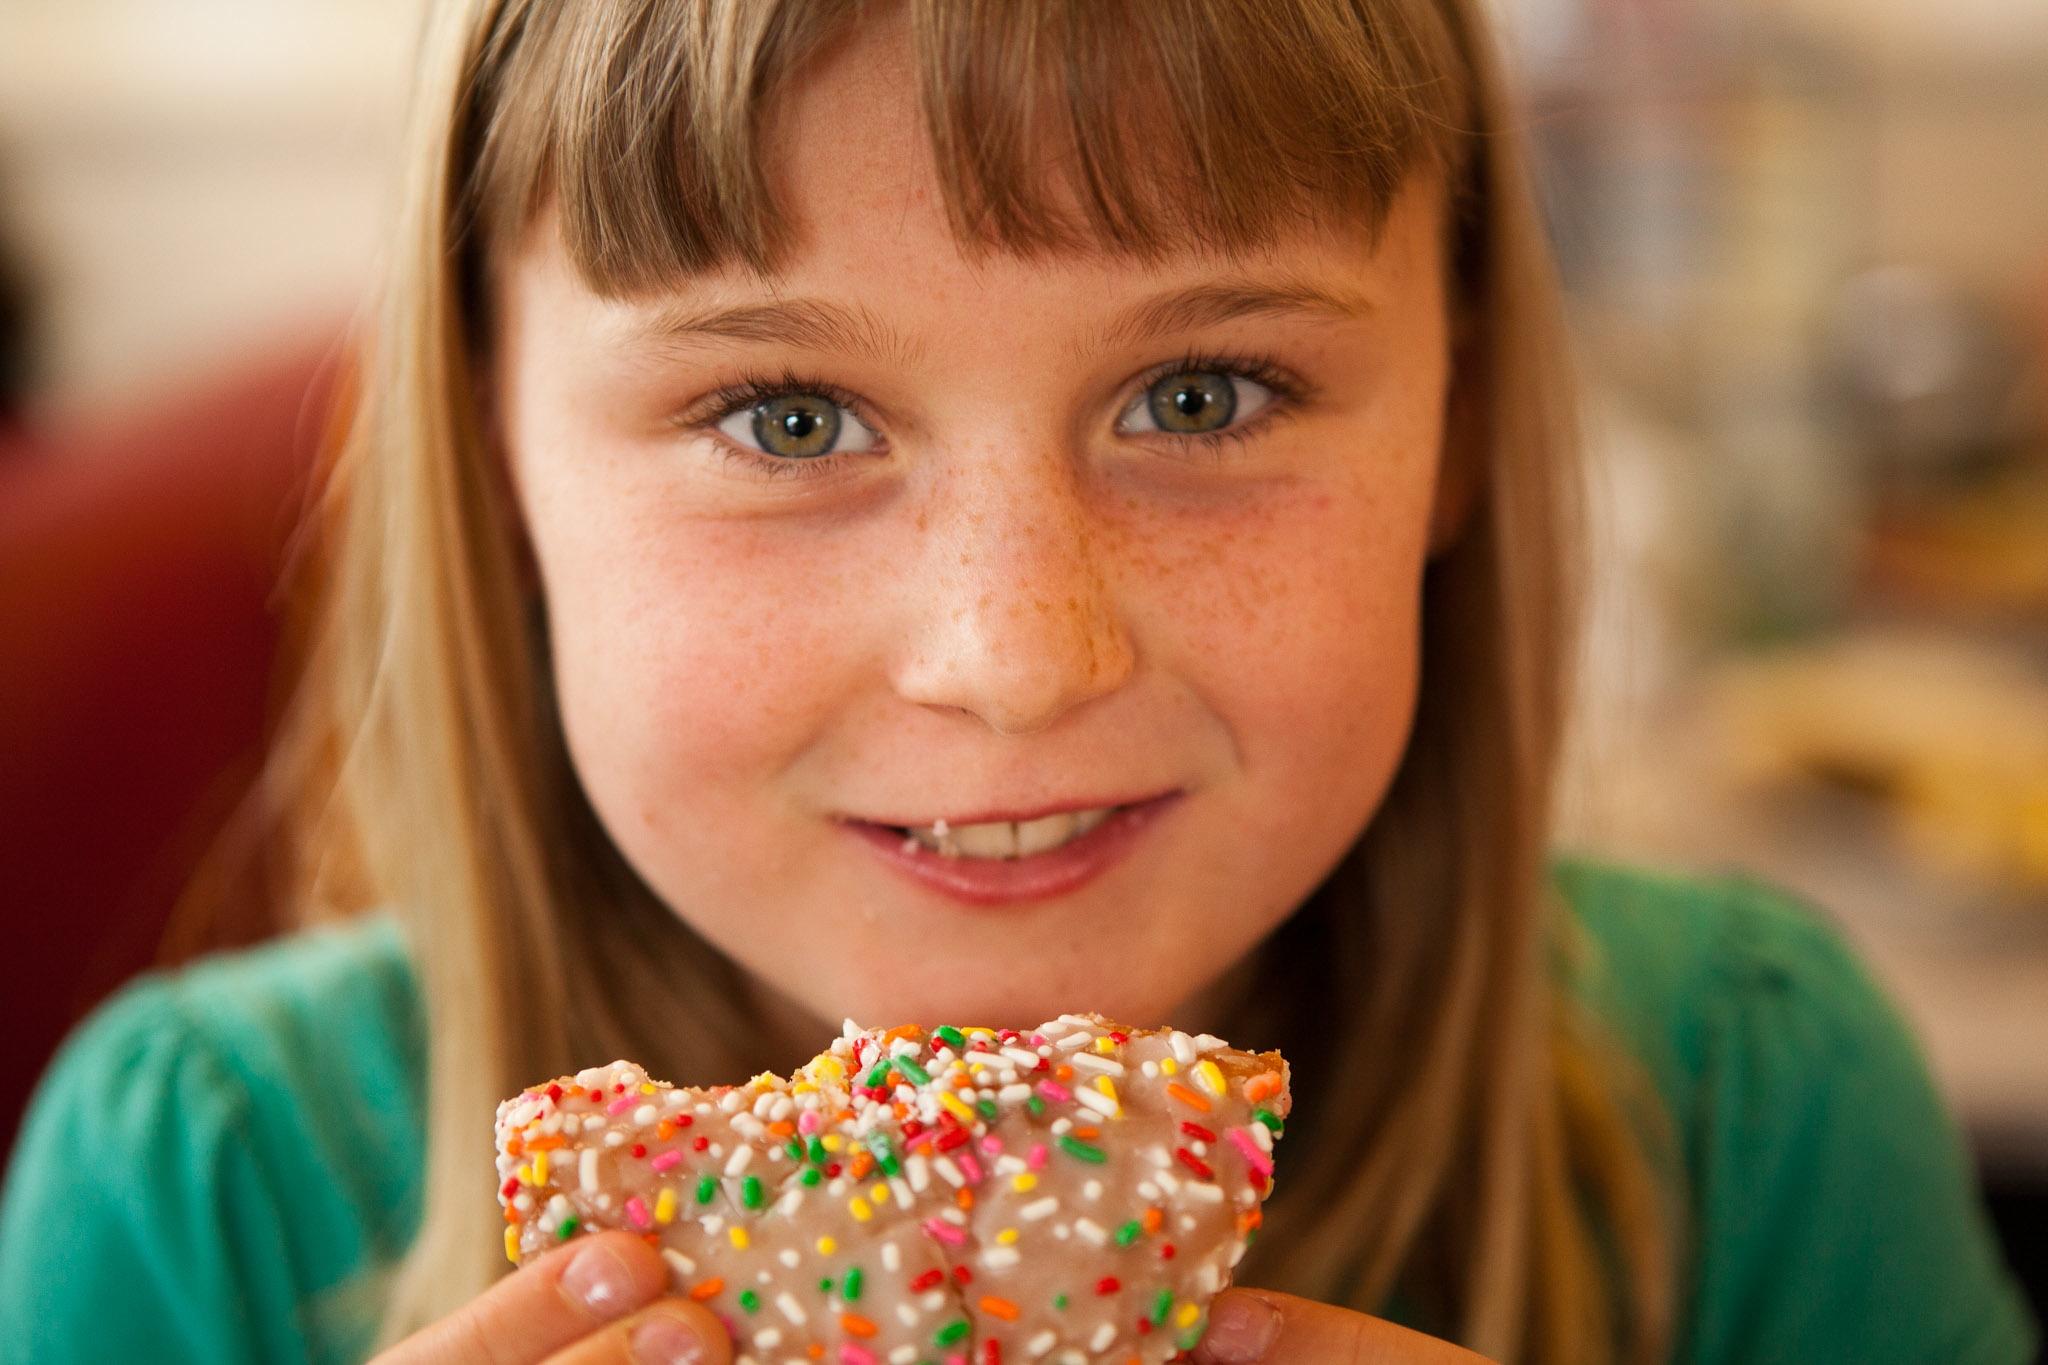 Yummy_Donut.jpg